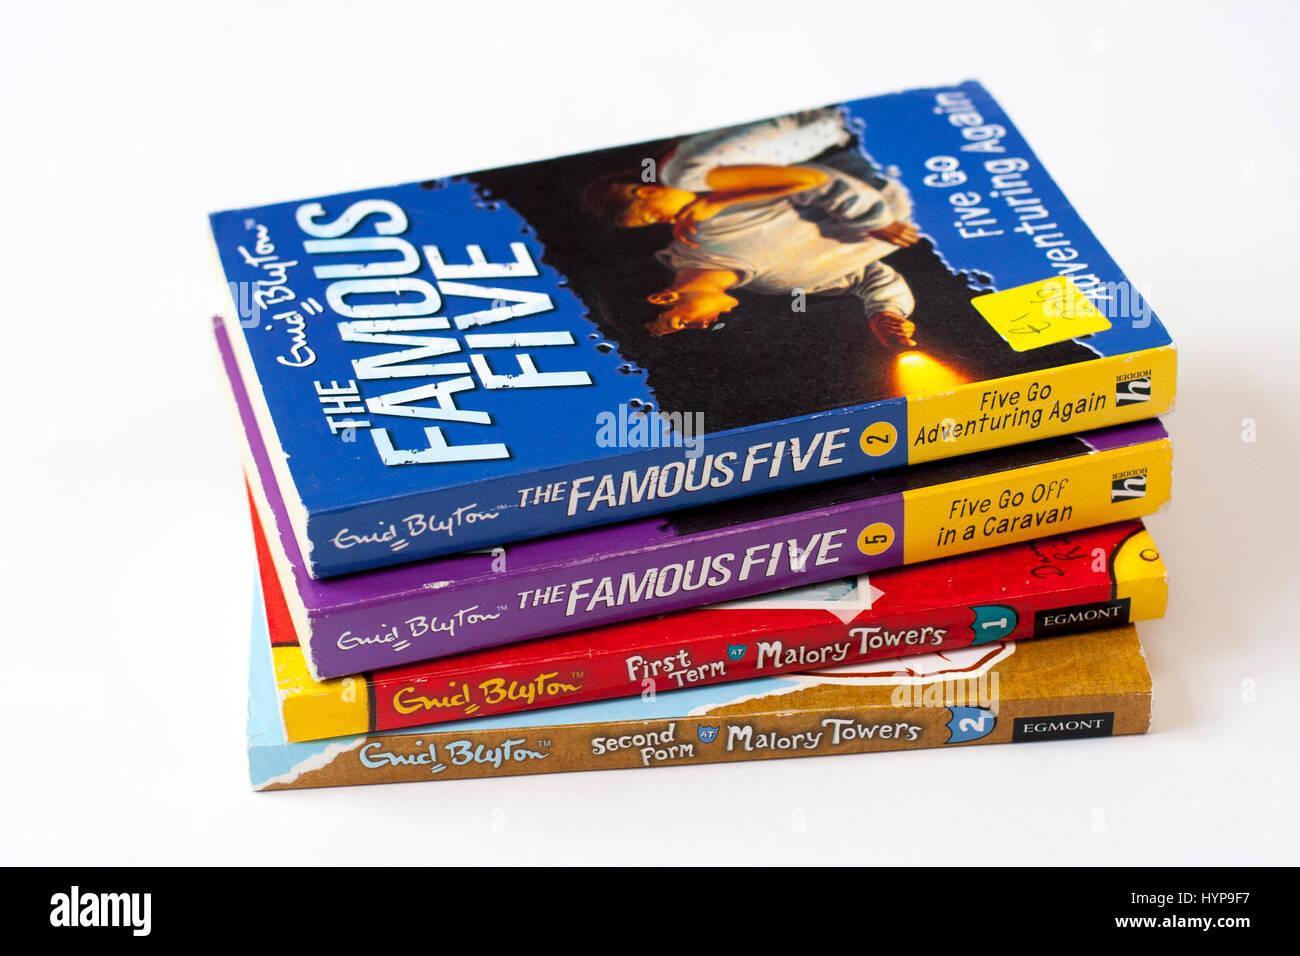 enid blyton famous five free ebooks pdf